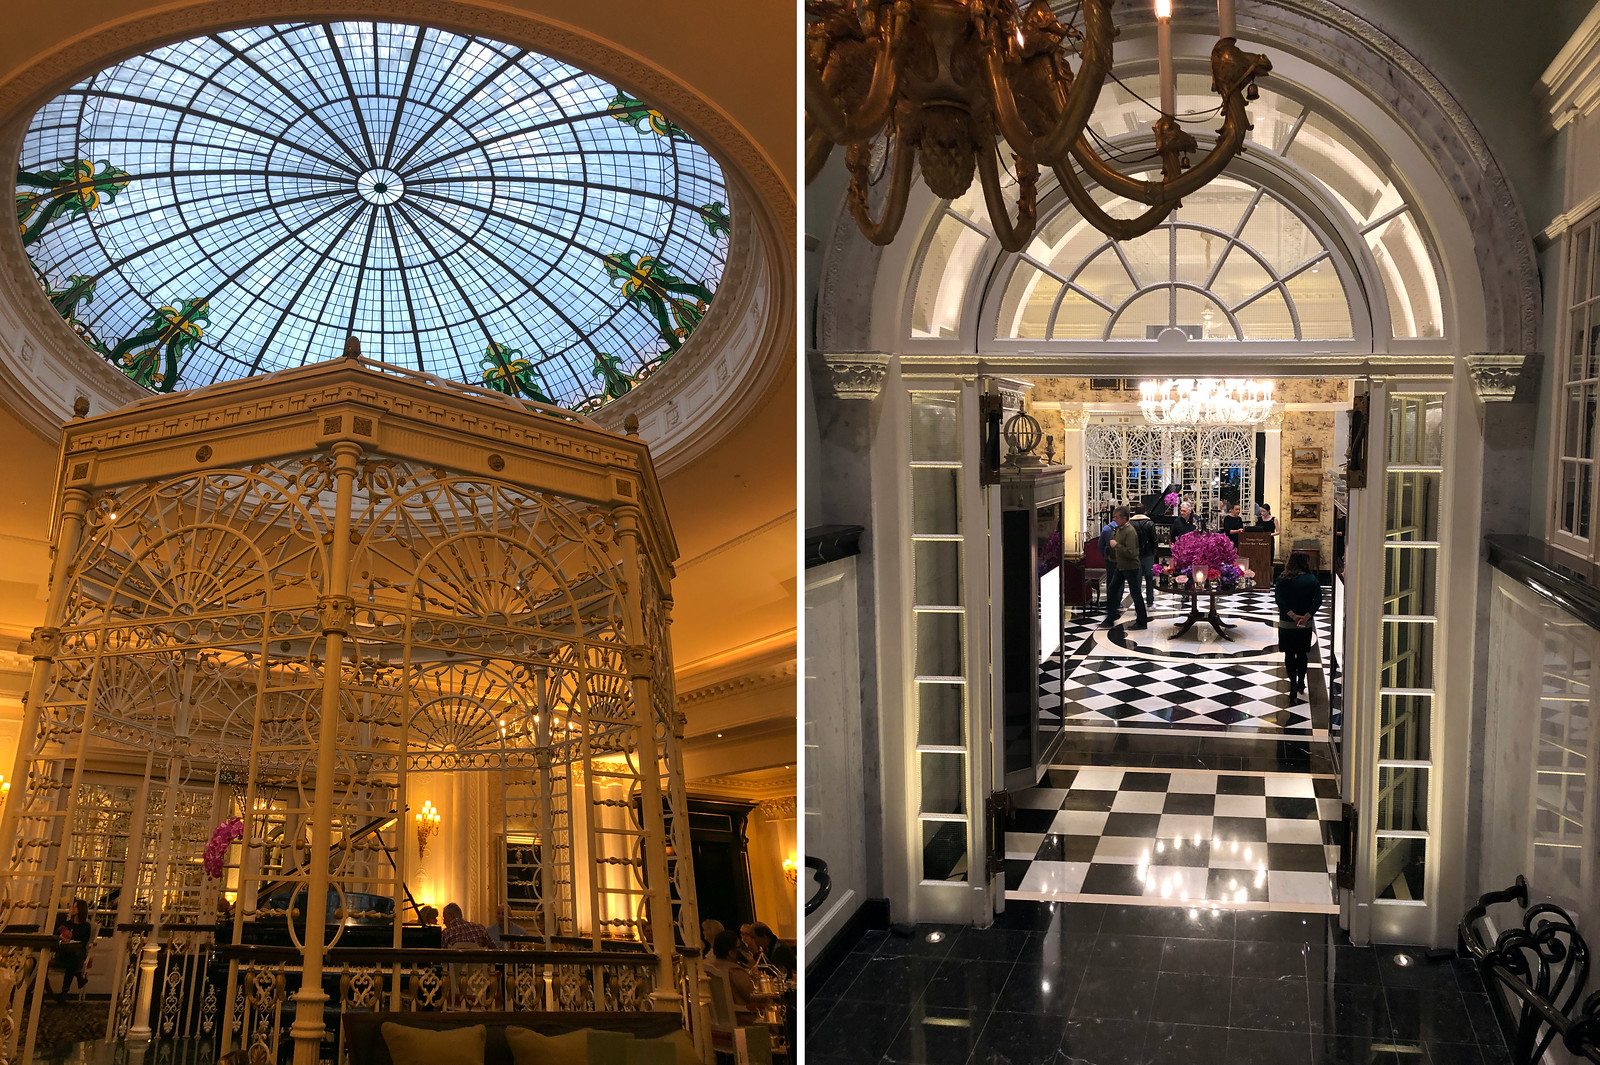 Hotel Savoy de Londres - The Savoy London - Thewotme hotel savoy de londres - 50940597932 f43fe7fb2d h - El histórico Hotel Savoy de Londres